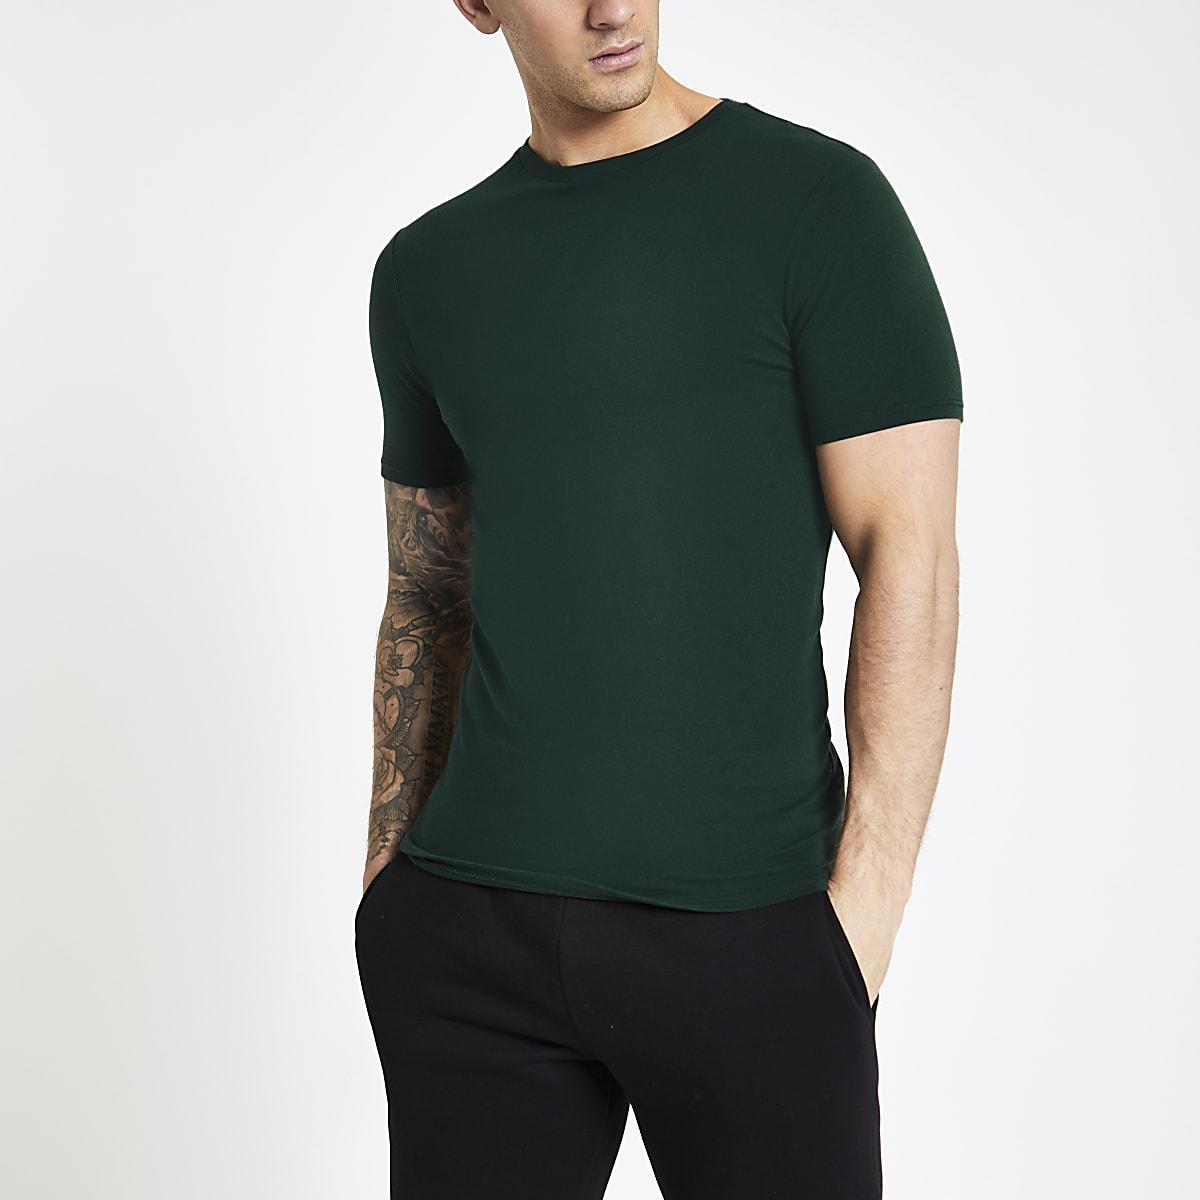 Green short sleeve muscle fit T-shirt